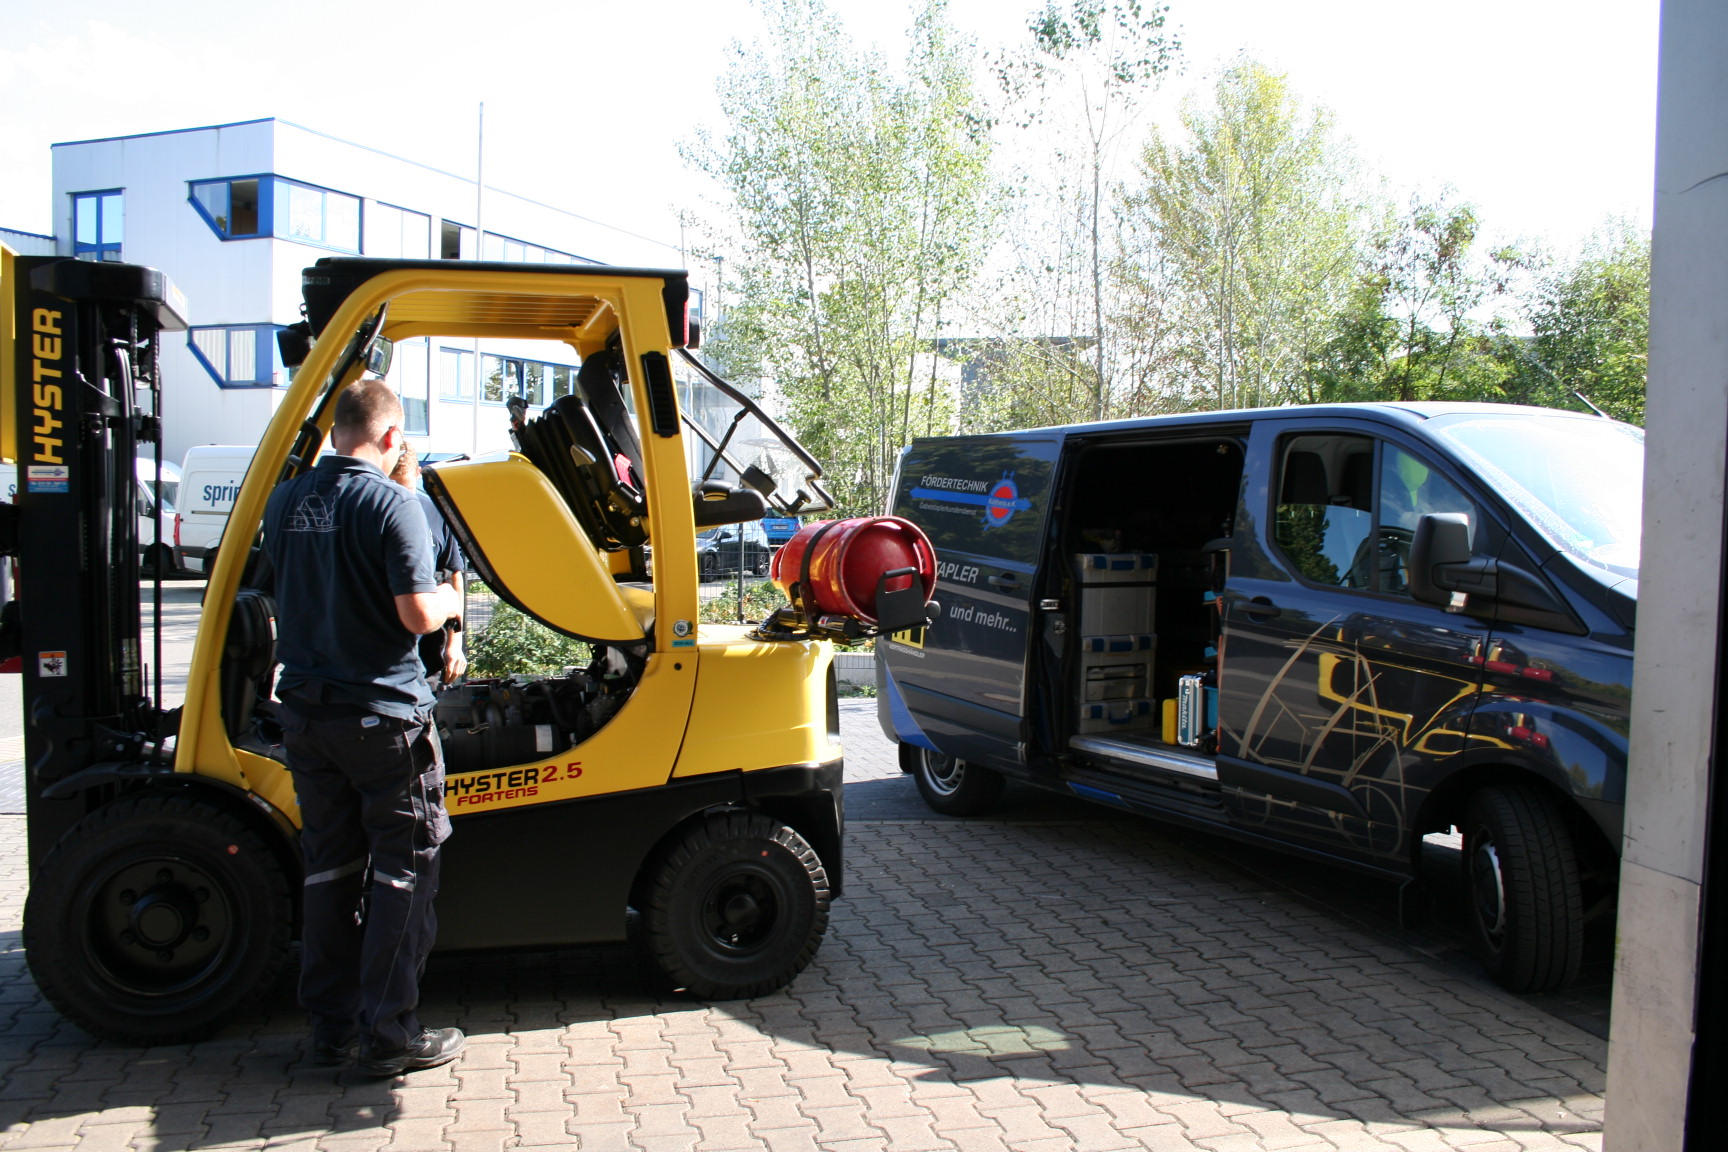 Gabelstapler Service vor Ort